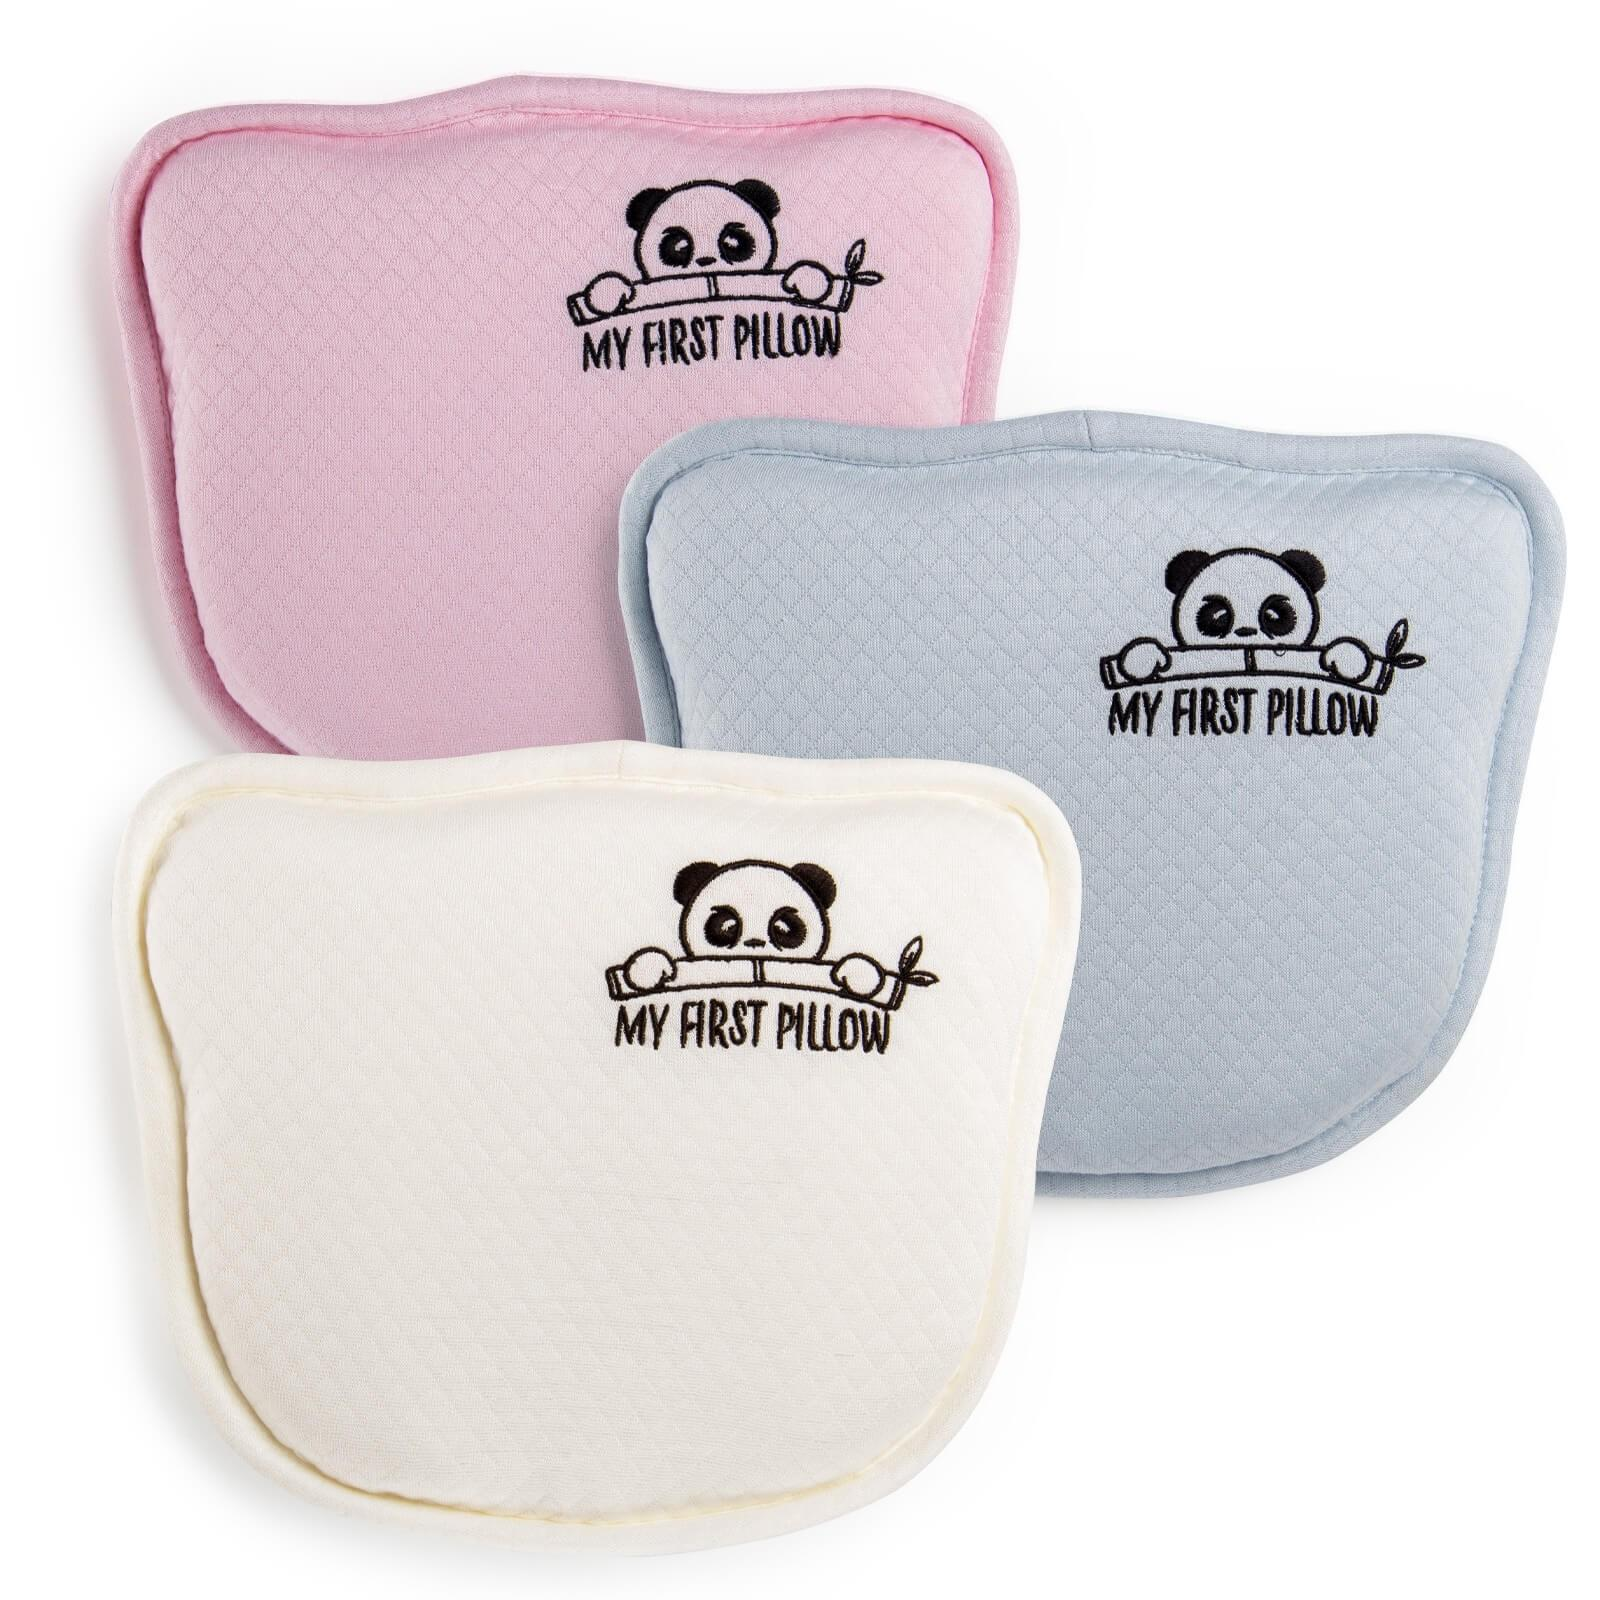 20370_20371_20372_202_pillow_baby_panda-web_1